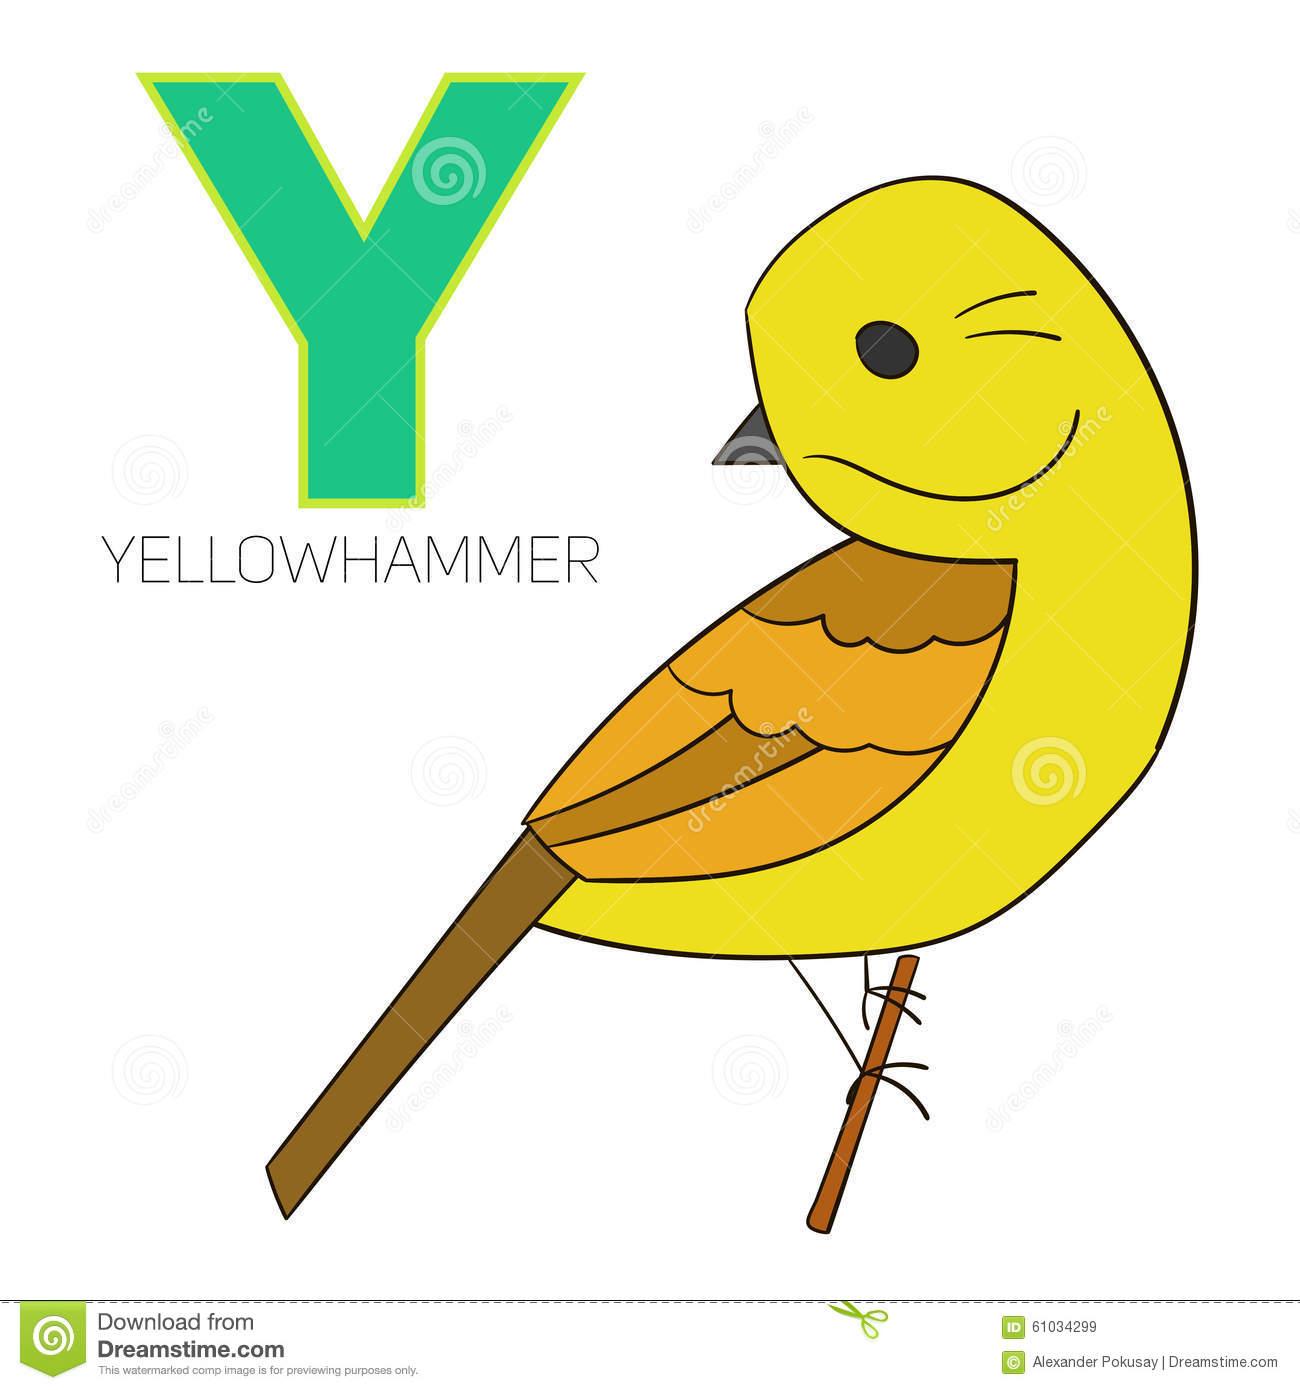 Yellowhammer Stock Illustrations.